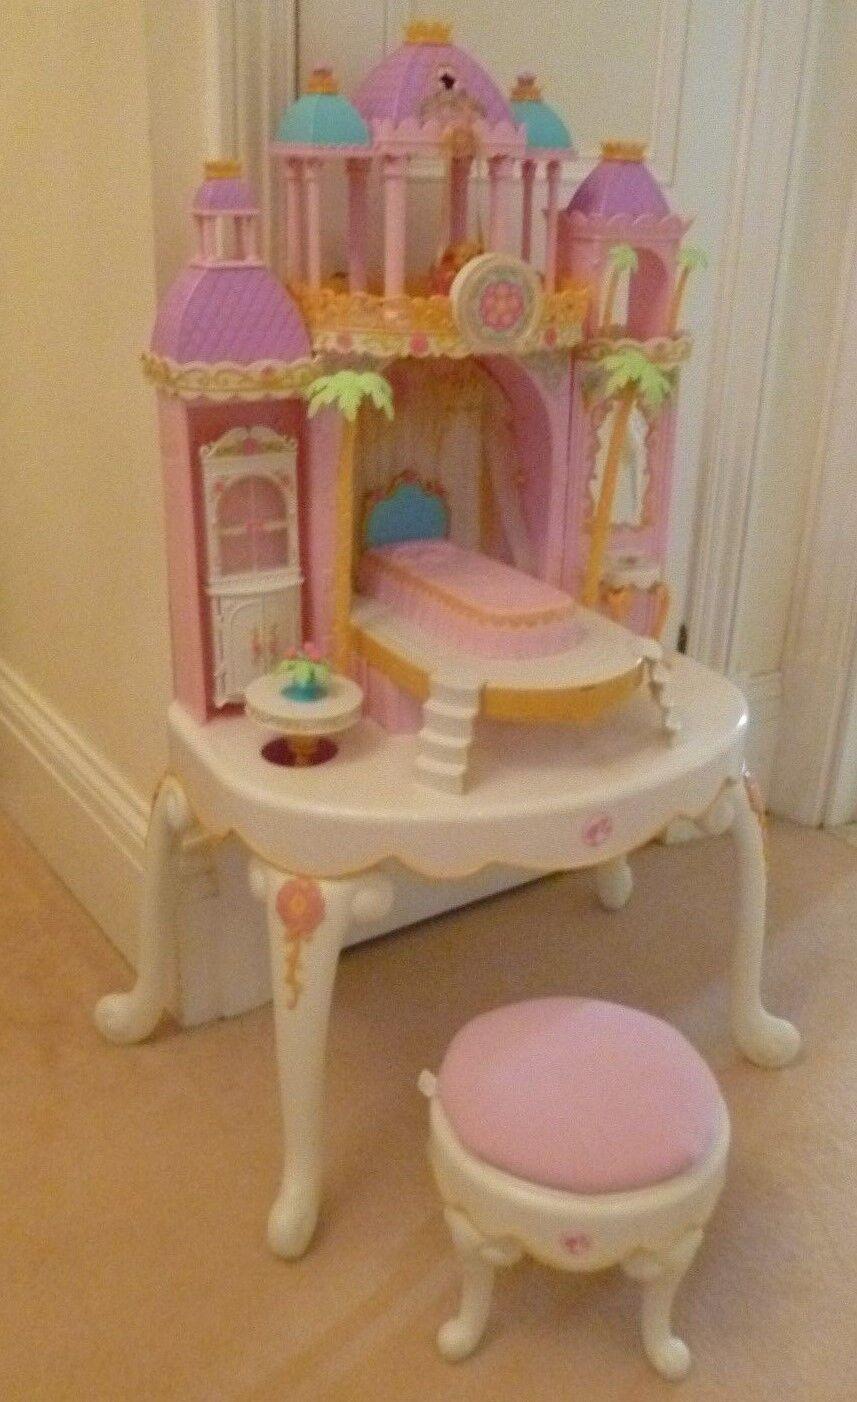 Girls Dressing Table - Barbie Island Princess Castle - Vanity Unit - Dolls House